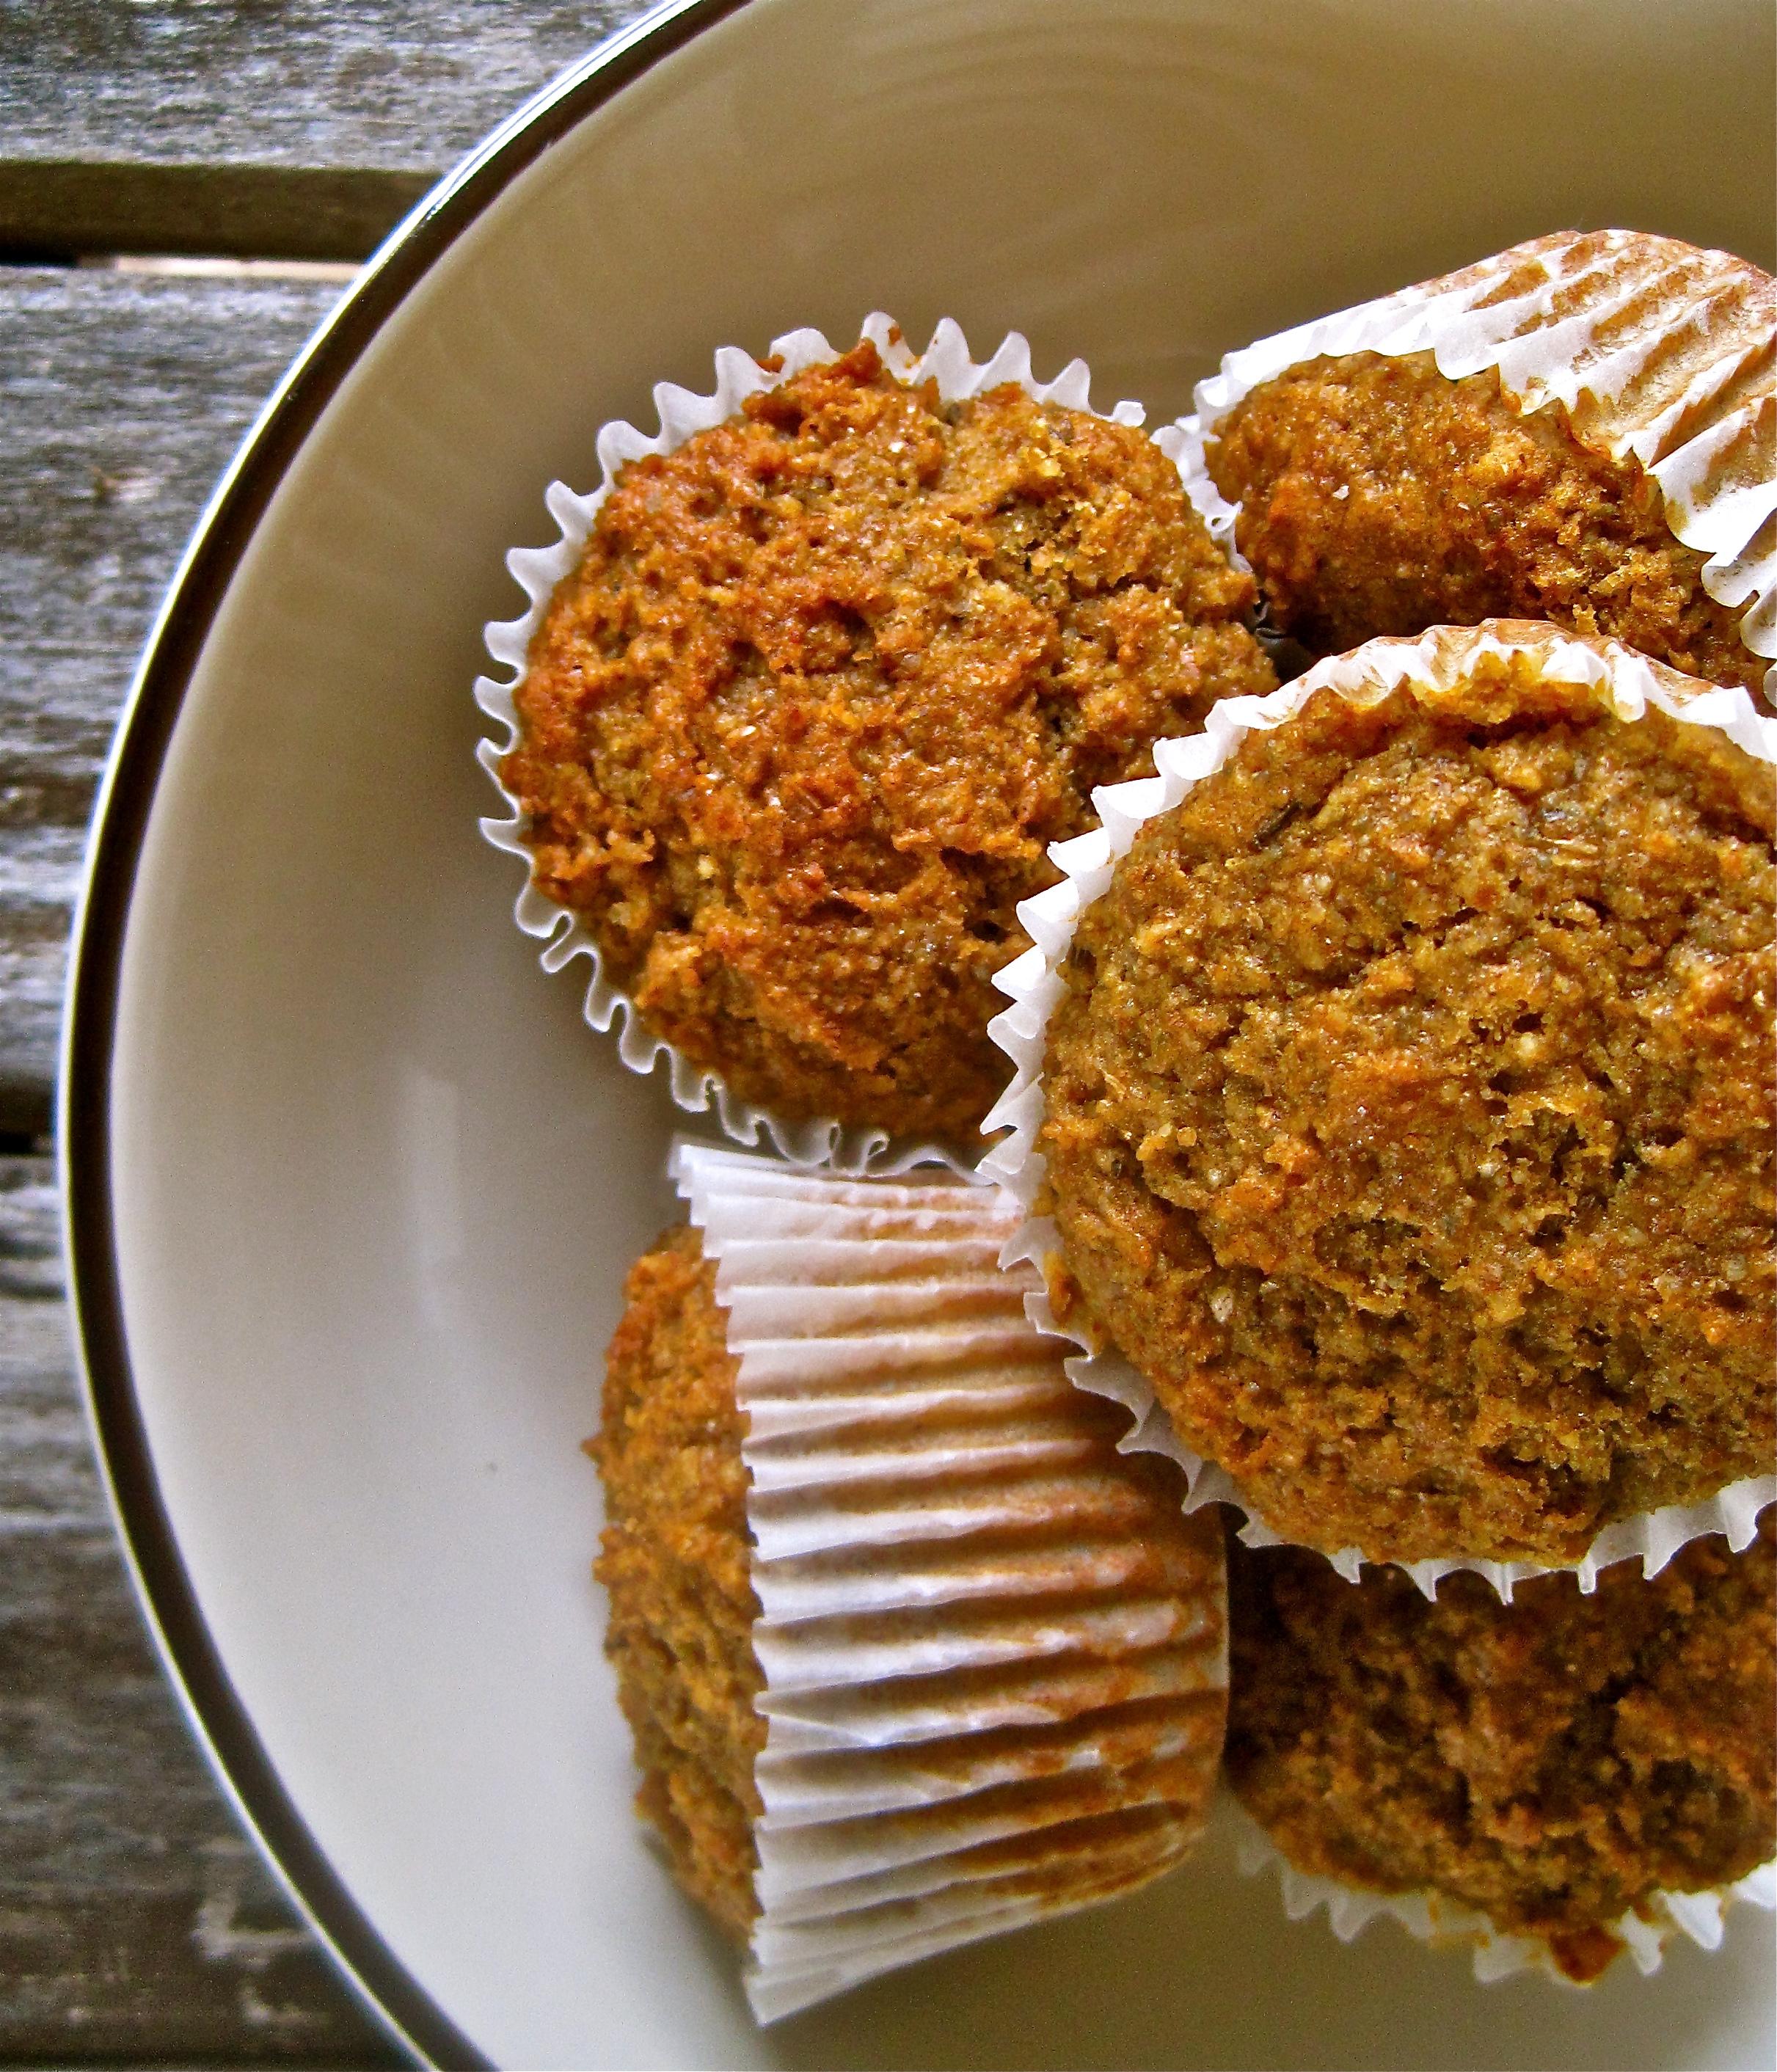 Caraway-Rye Corn Muffins